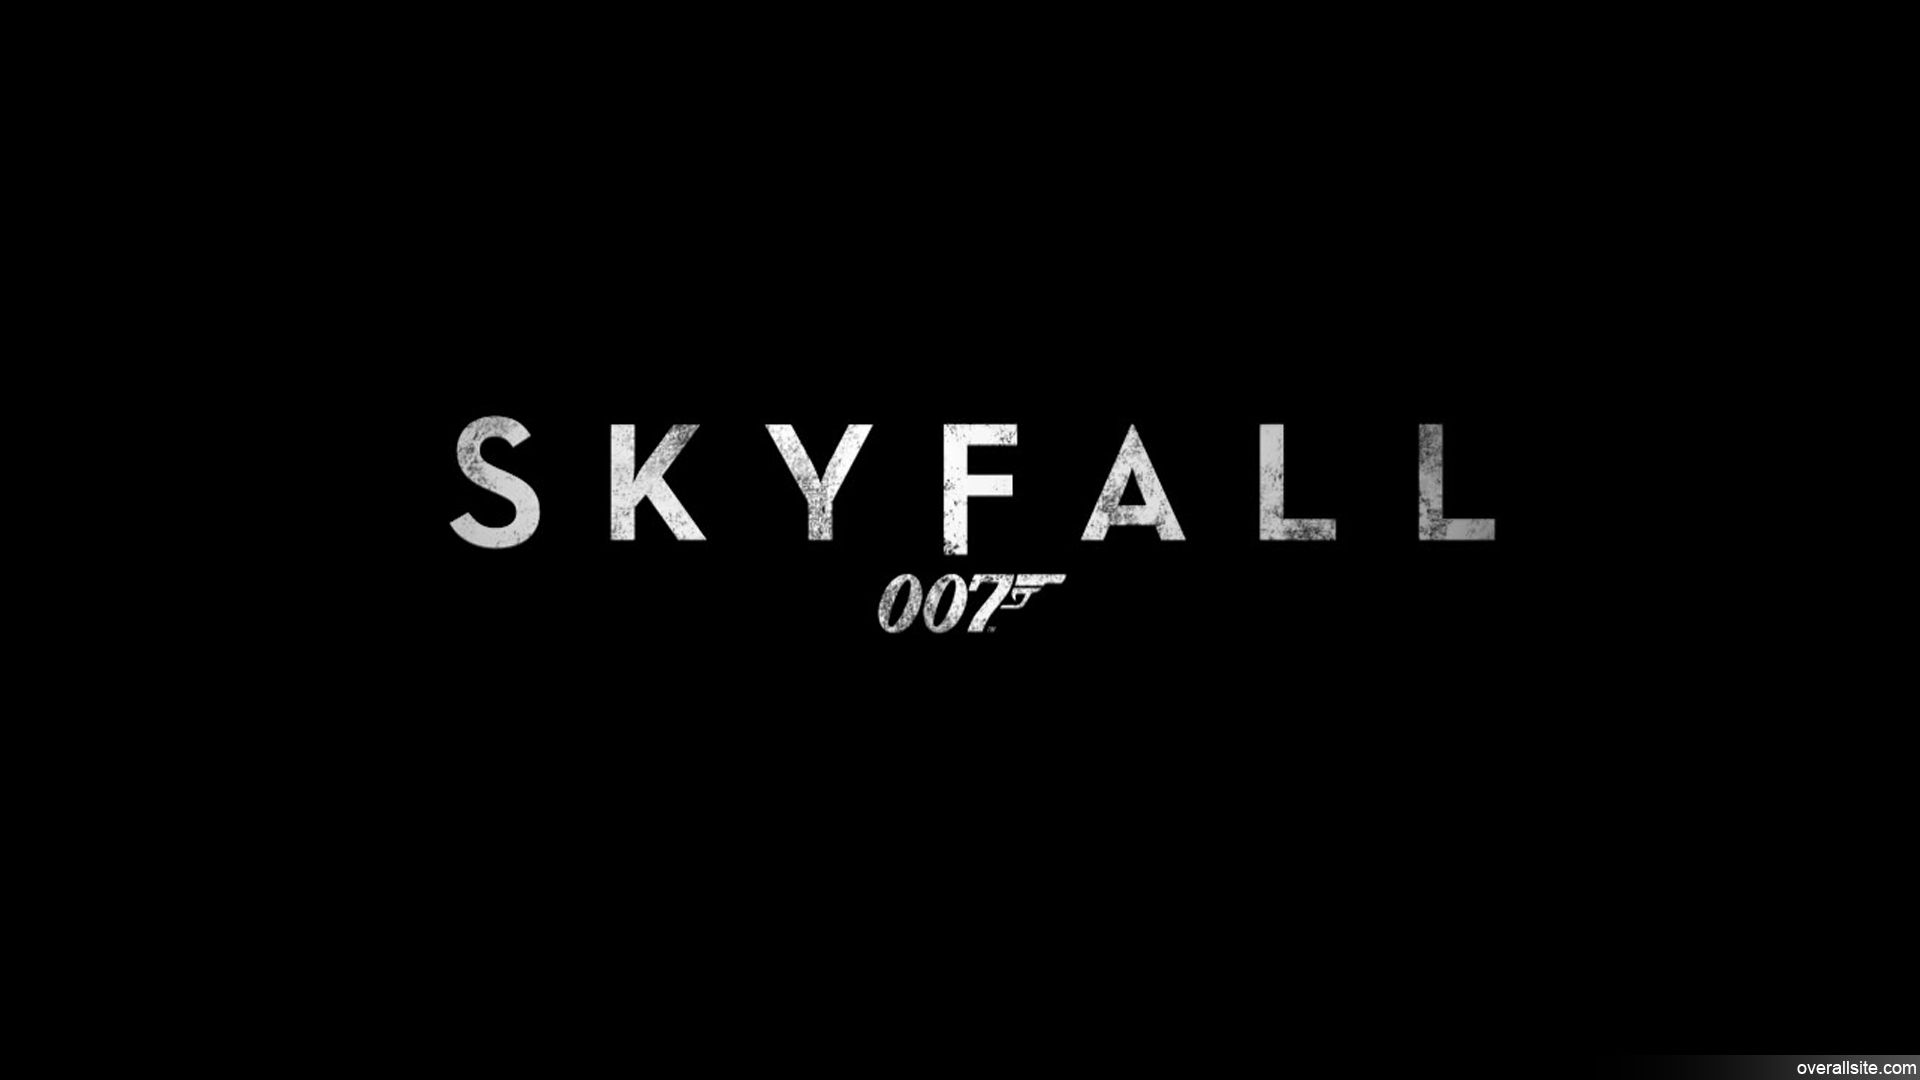 Skyfall 007 Wallpapers Thesmashable Com Skyfall Music Book Songs